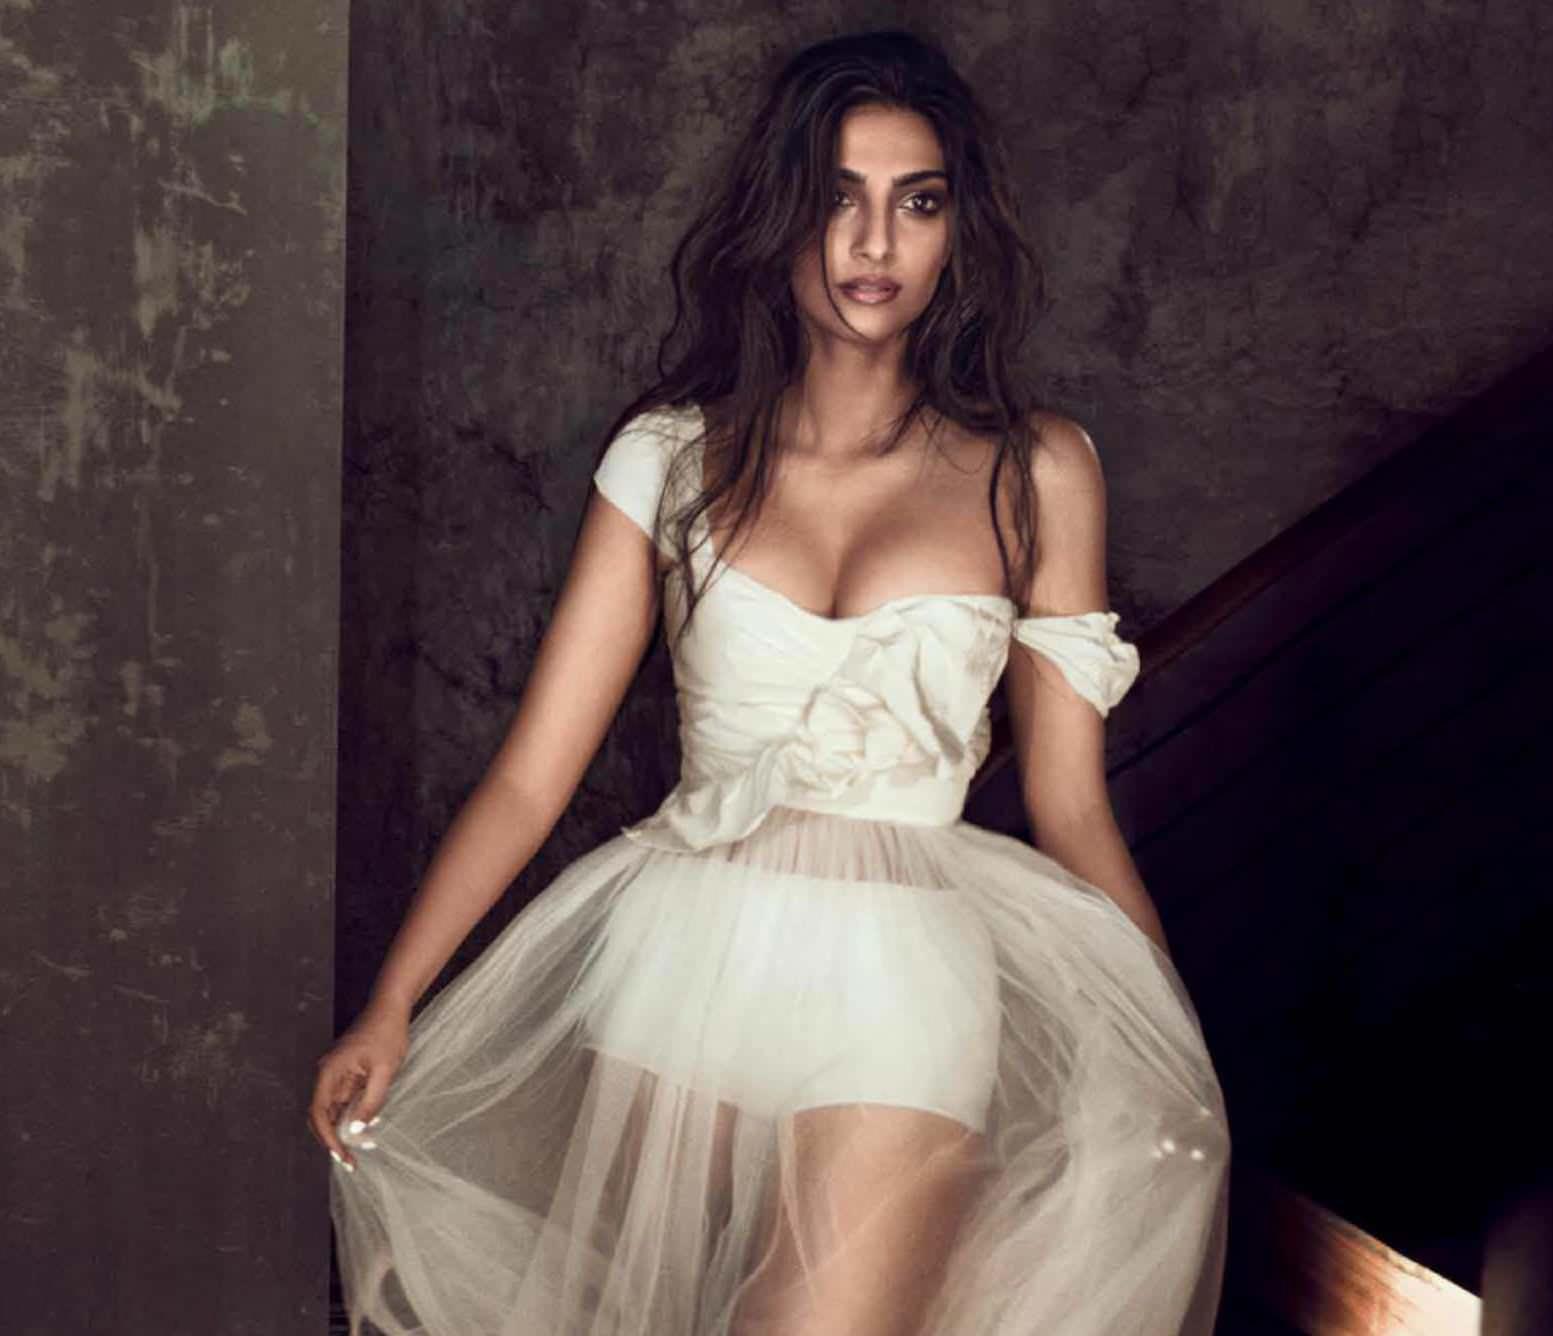 The Fabulous Life Of Sonam Kapoor